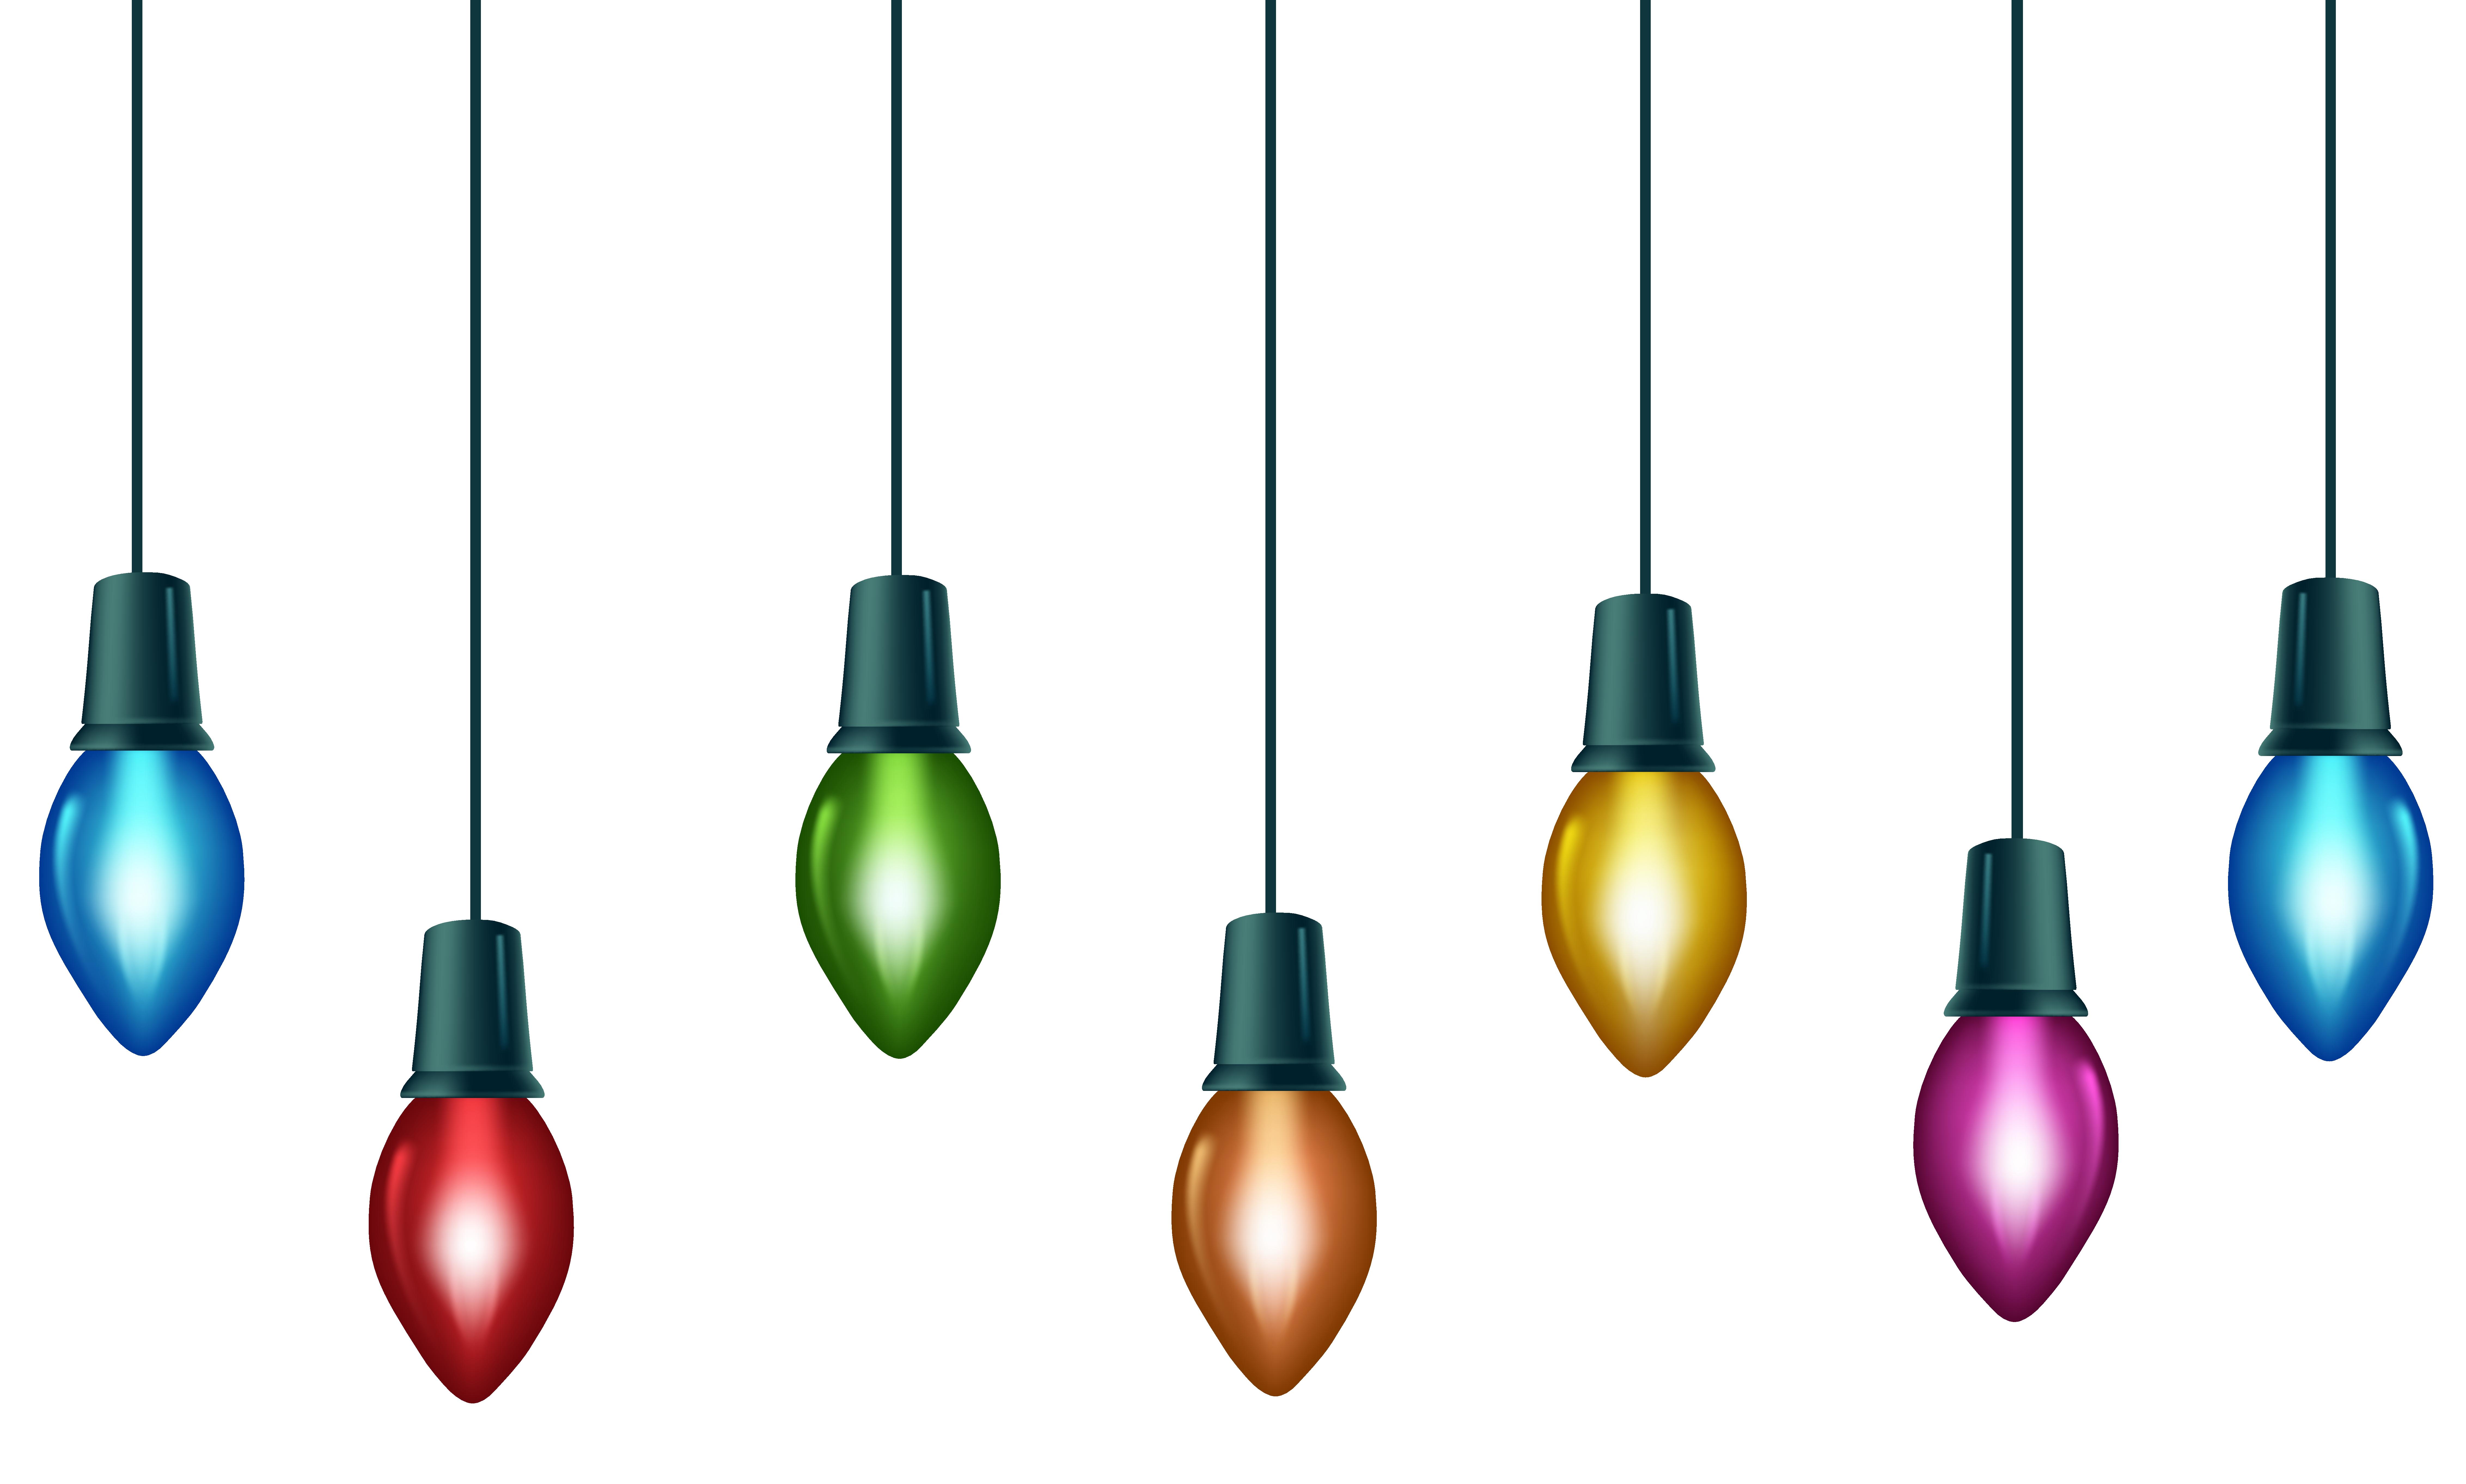 9056x5451 Christmas Colorful Bulbs Png Clip Art Imageu200b Gallery